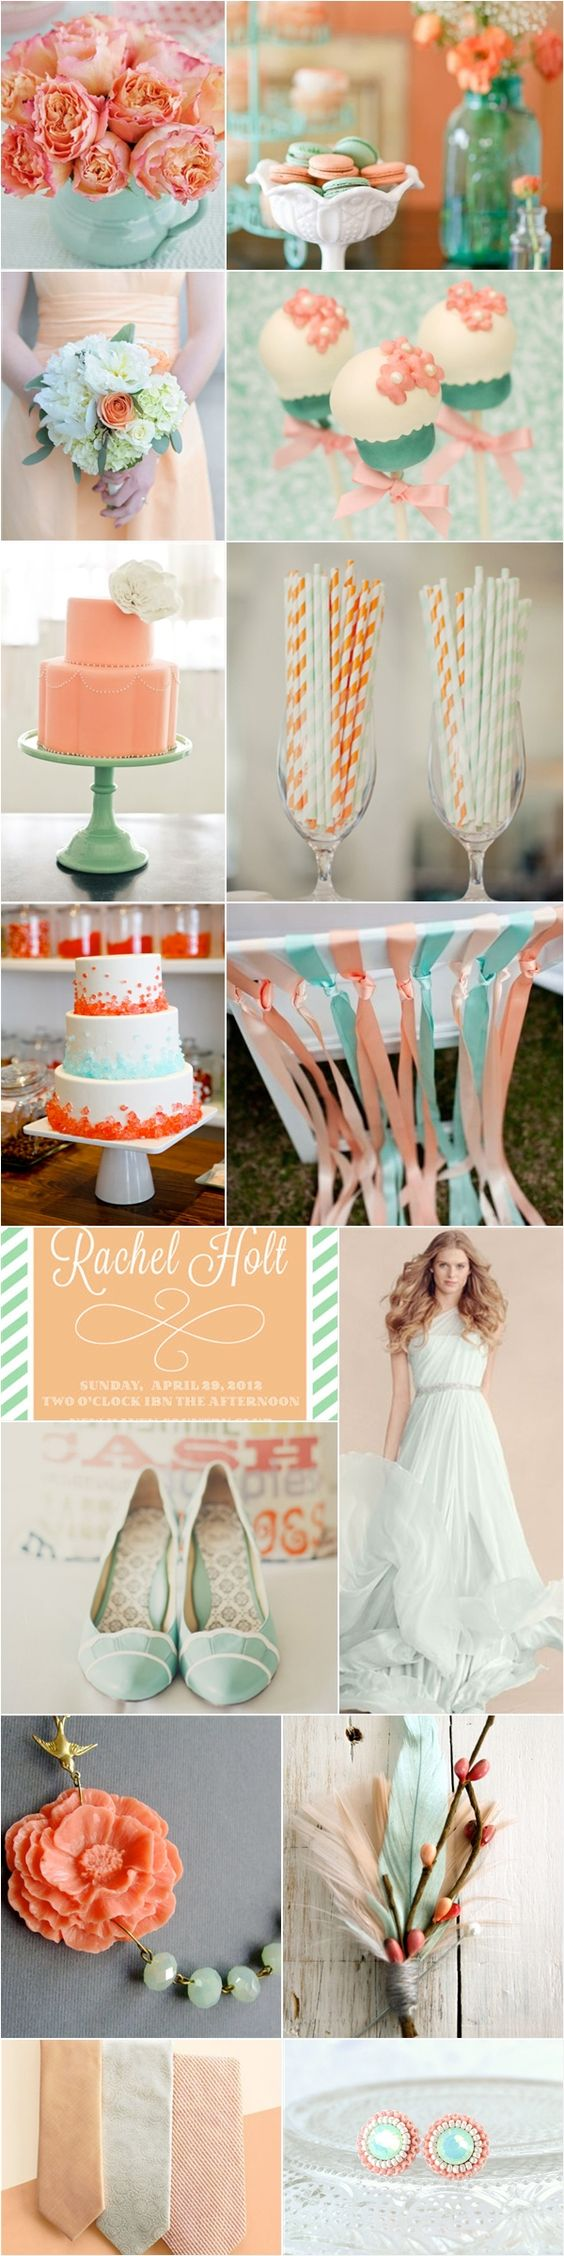 Praise Wedding » Wedding Inspiration and Planning » Wedding Color Palette – Mint Green & Peach